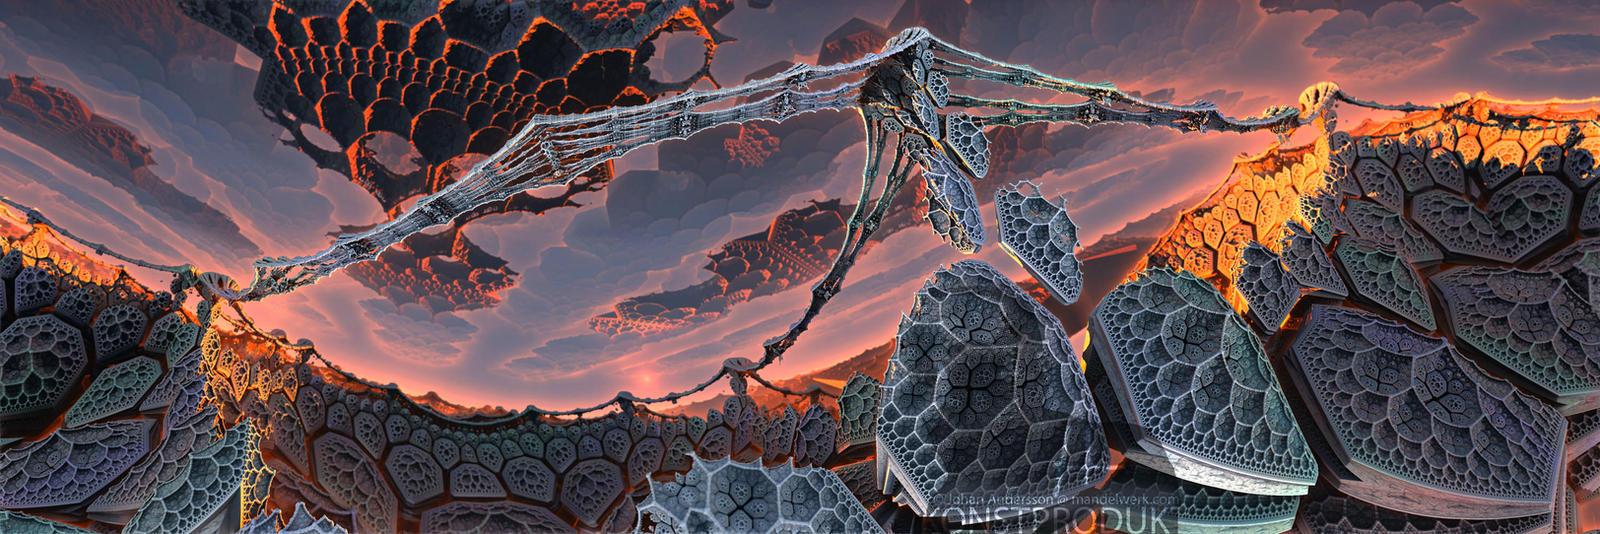 Neuron bridge of sanity collapse